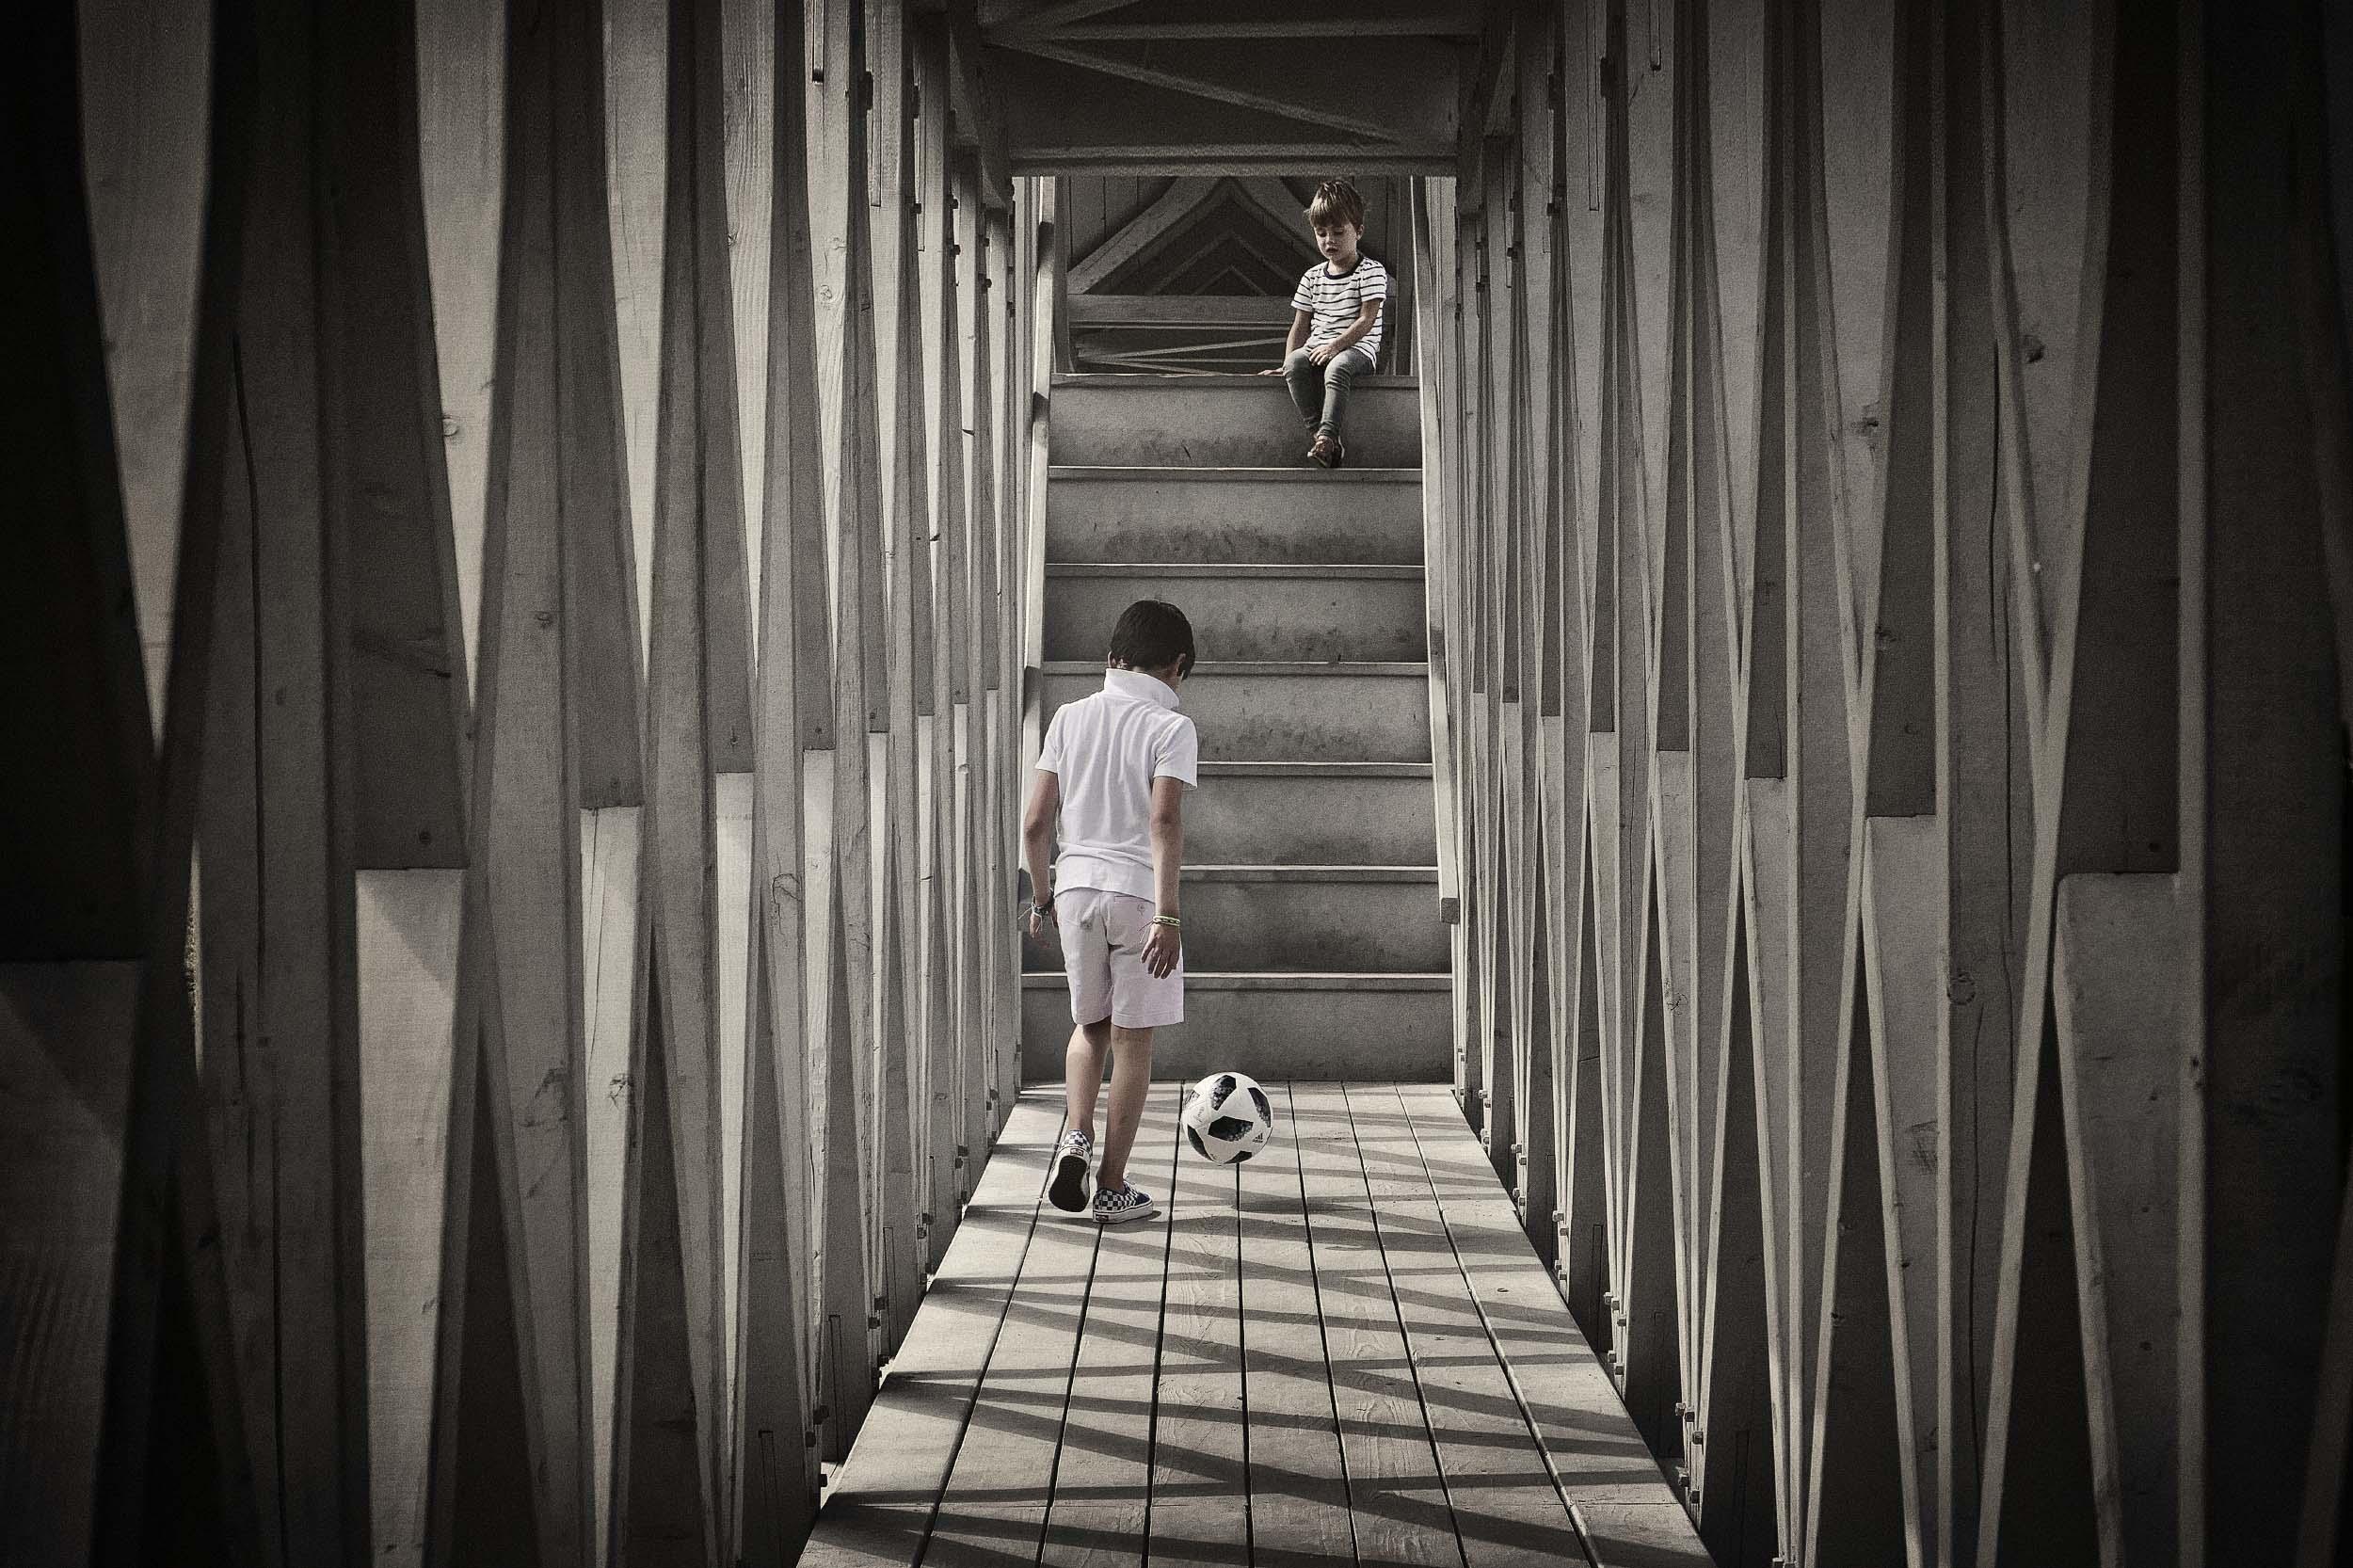 Foto de Carles Carreras, fotògraf creatiu a Girona, Catalunya